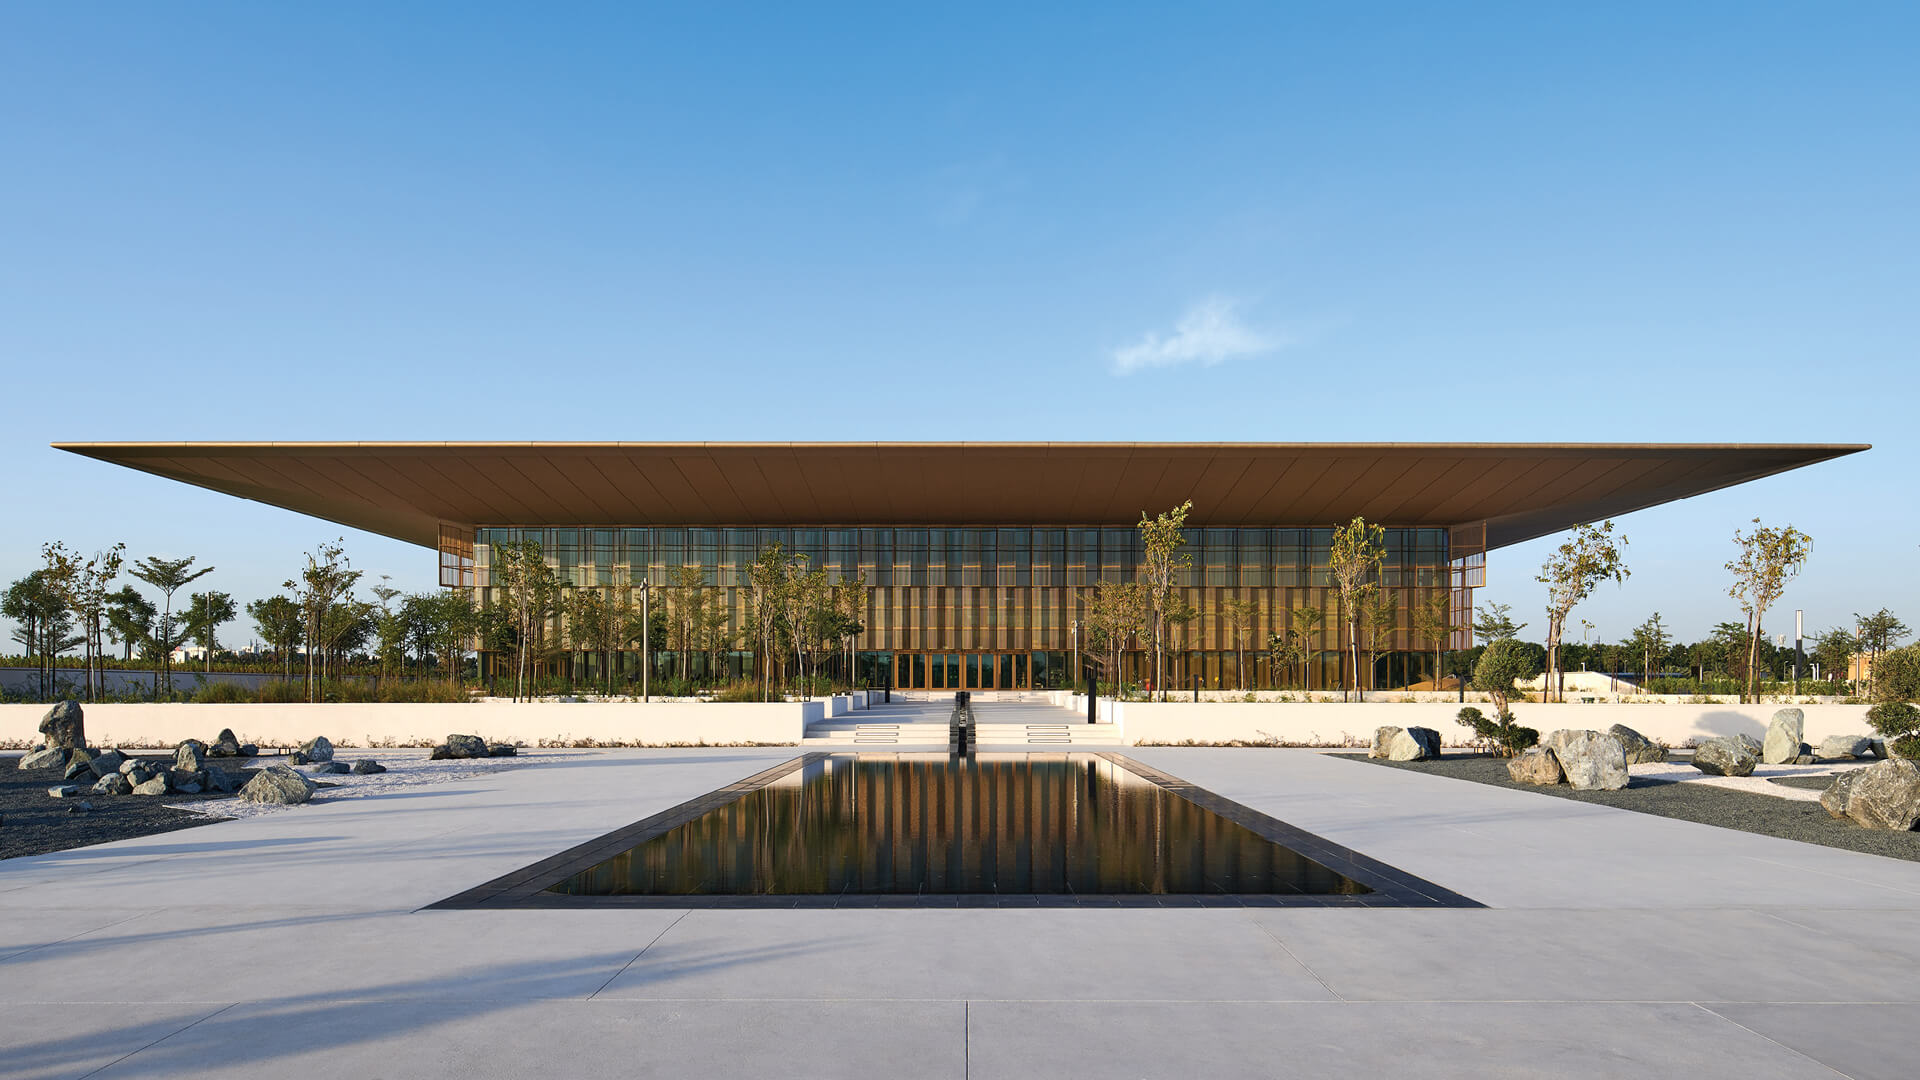 House of Wisdom designed by Foster + Partners | House of Wisdom Library designed by Foster + Partners| STIRworld